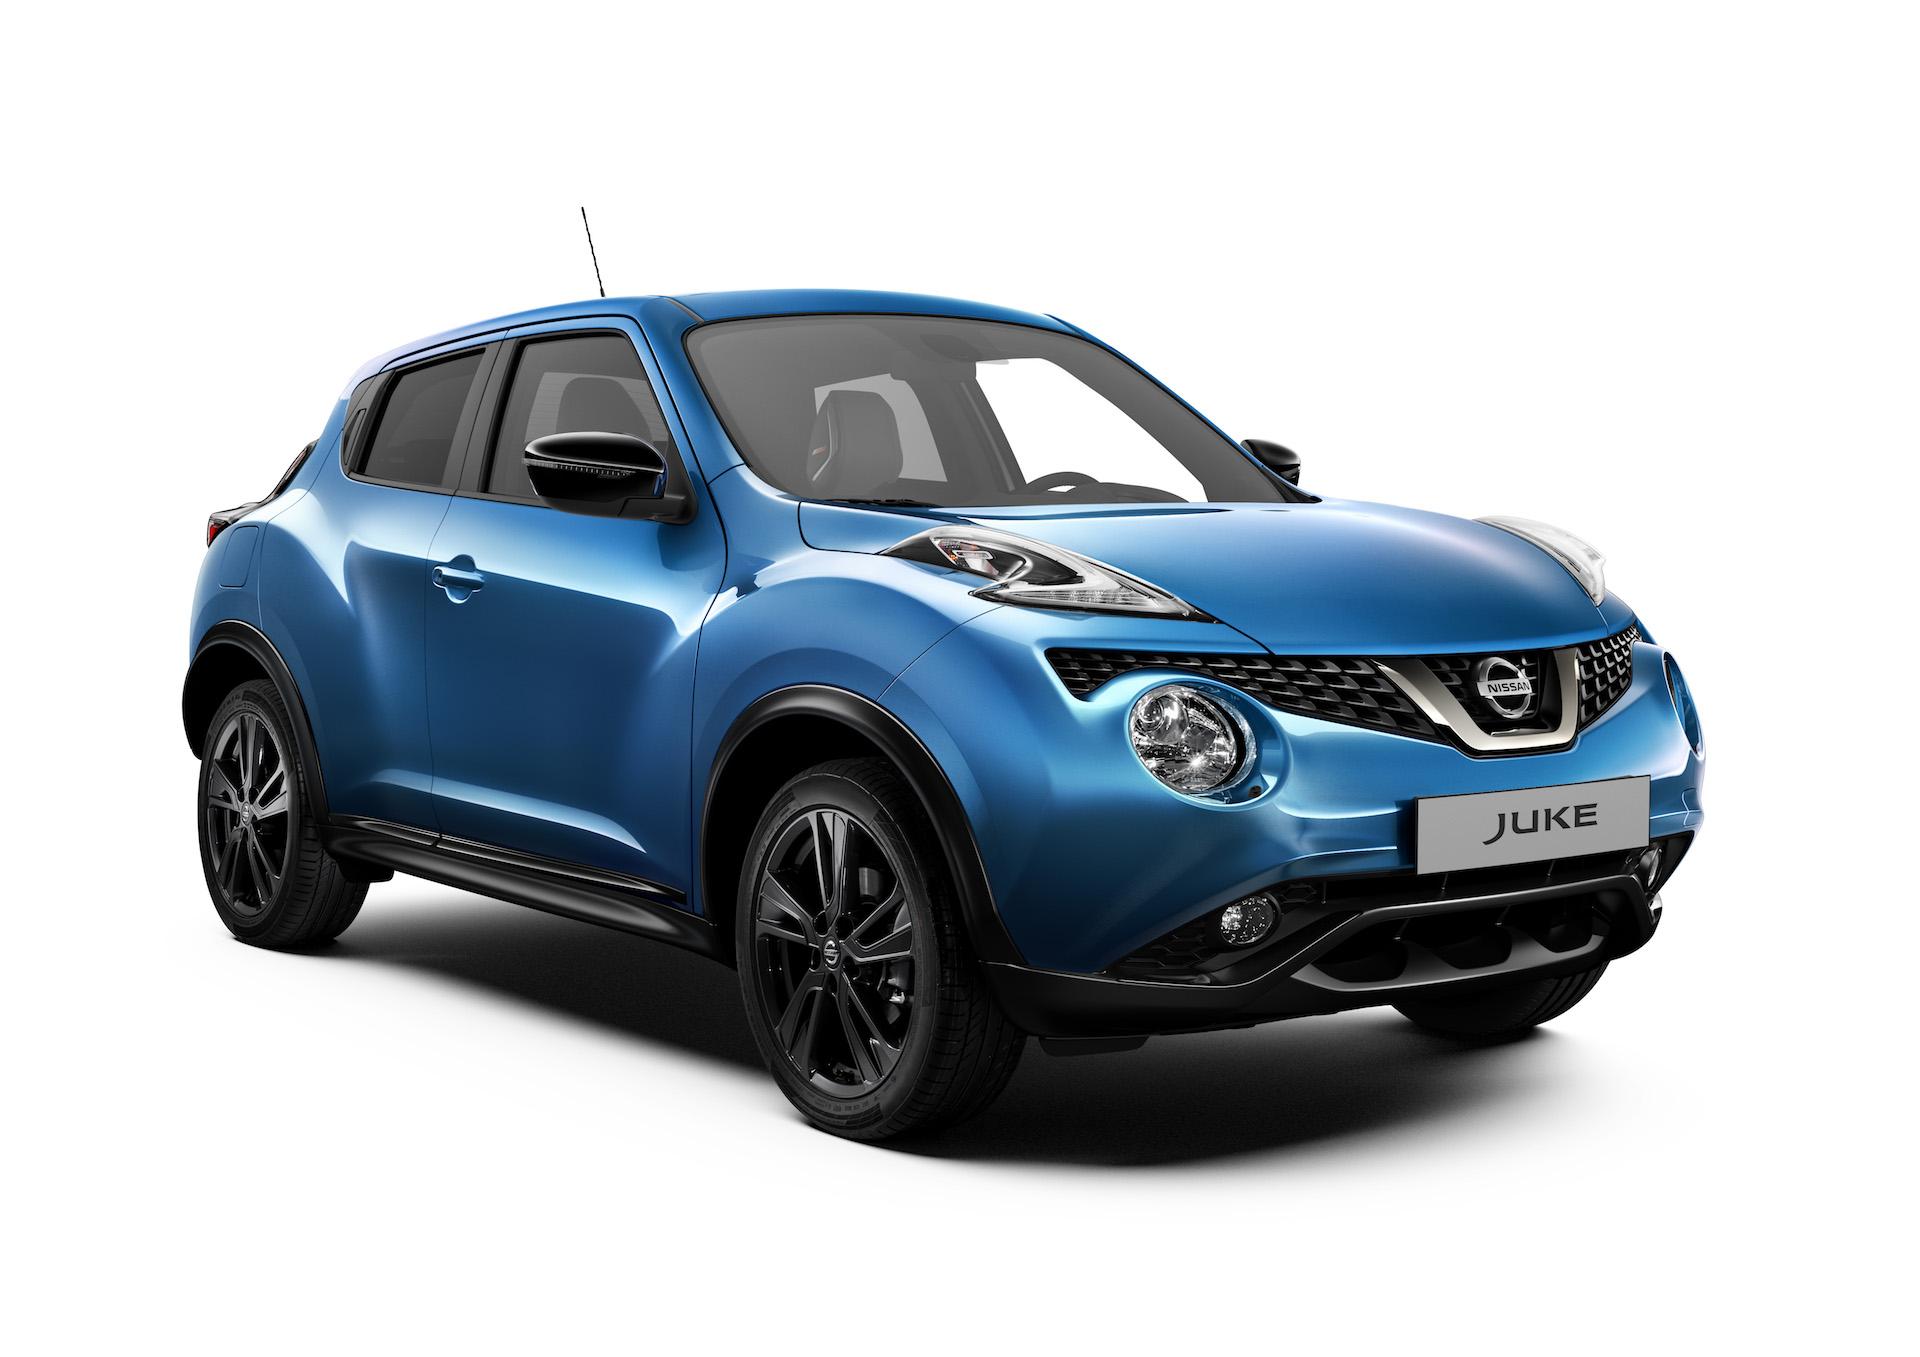 Nissan Juke 2018 blu 3/4 anteriore